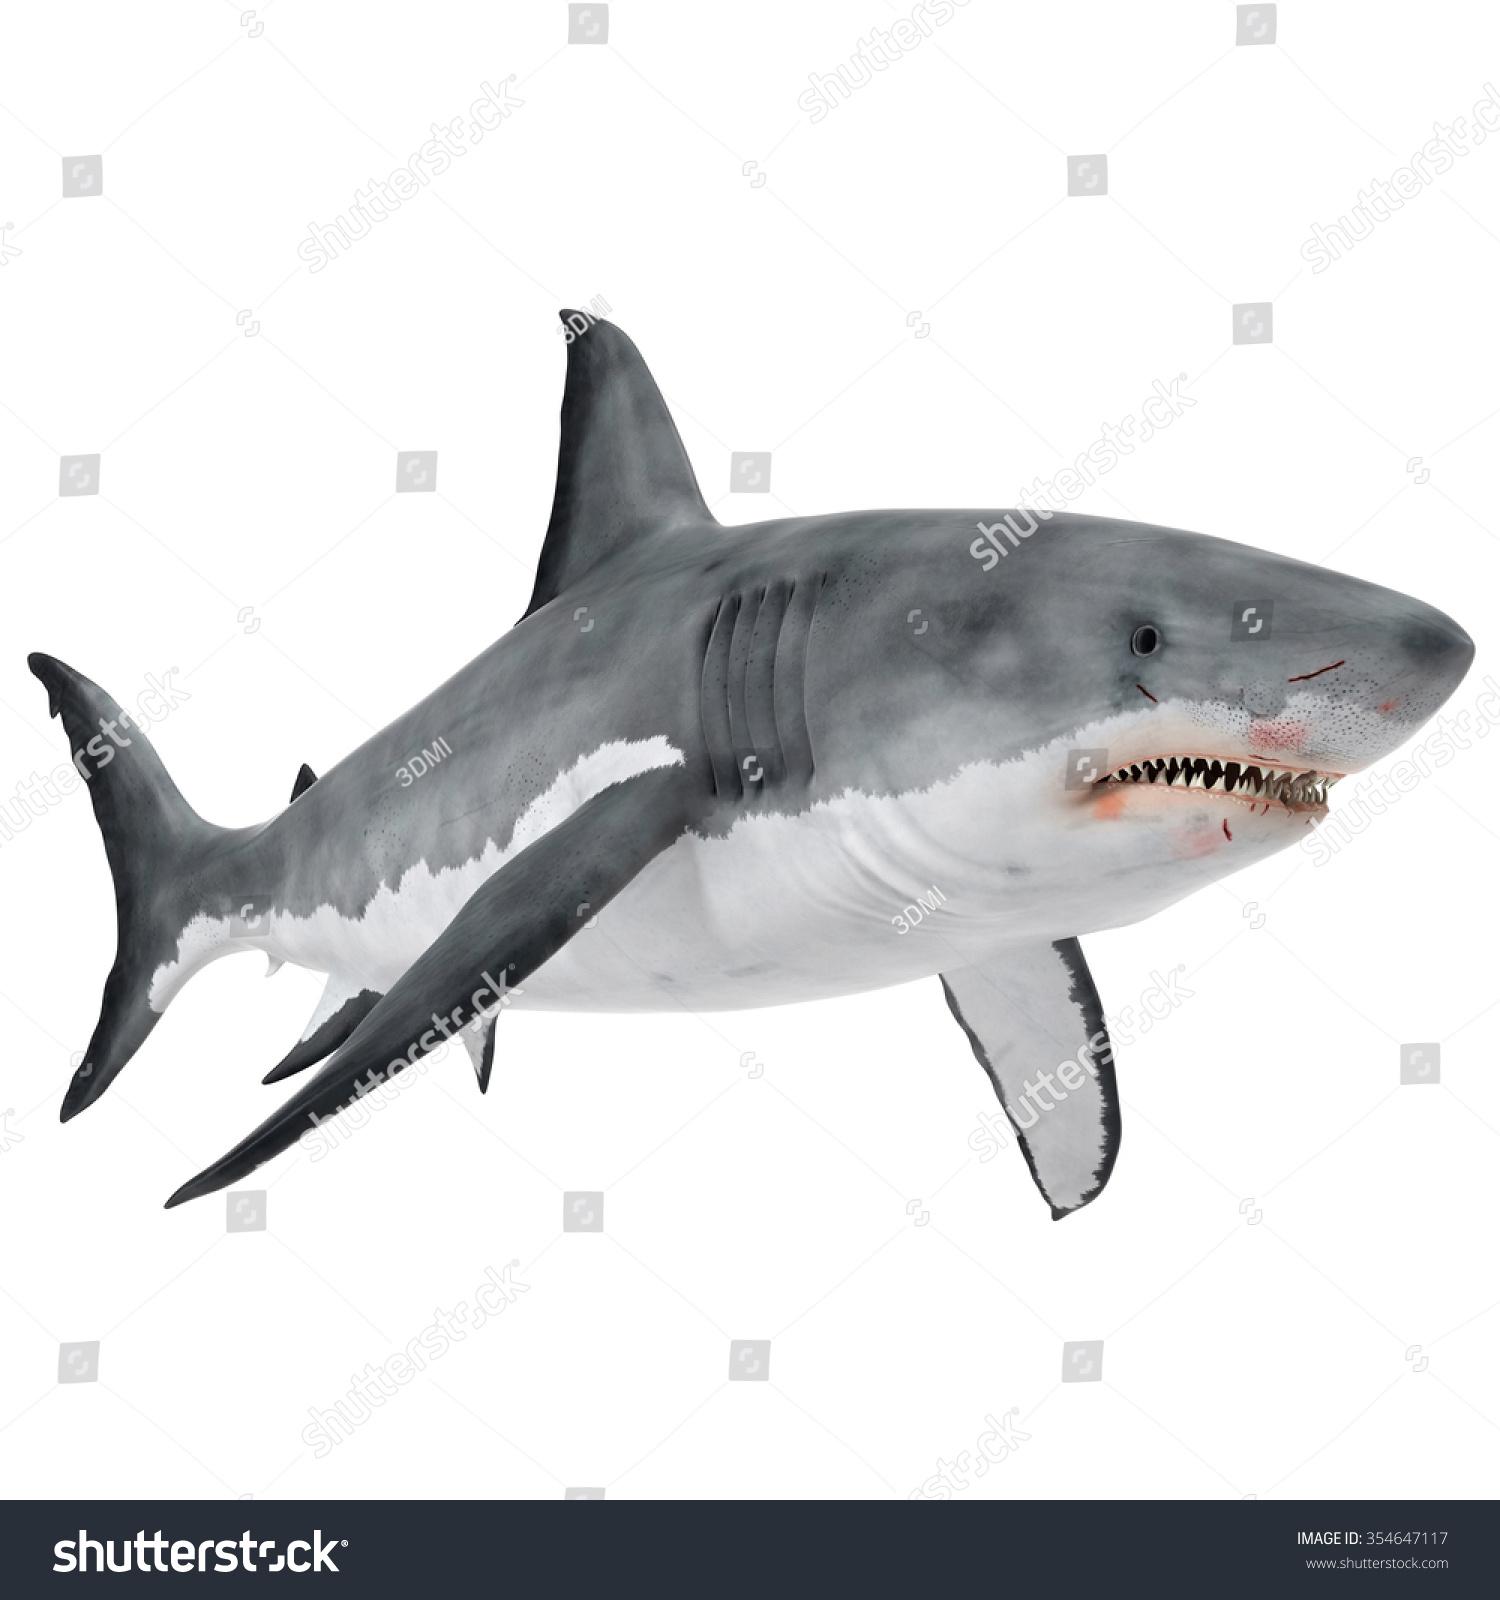 shark fin white background - photo #27